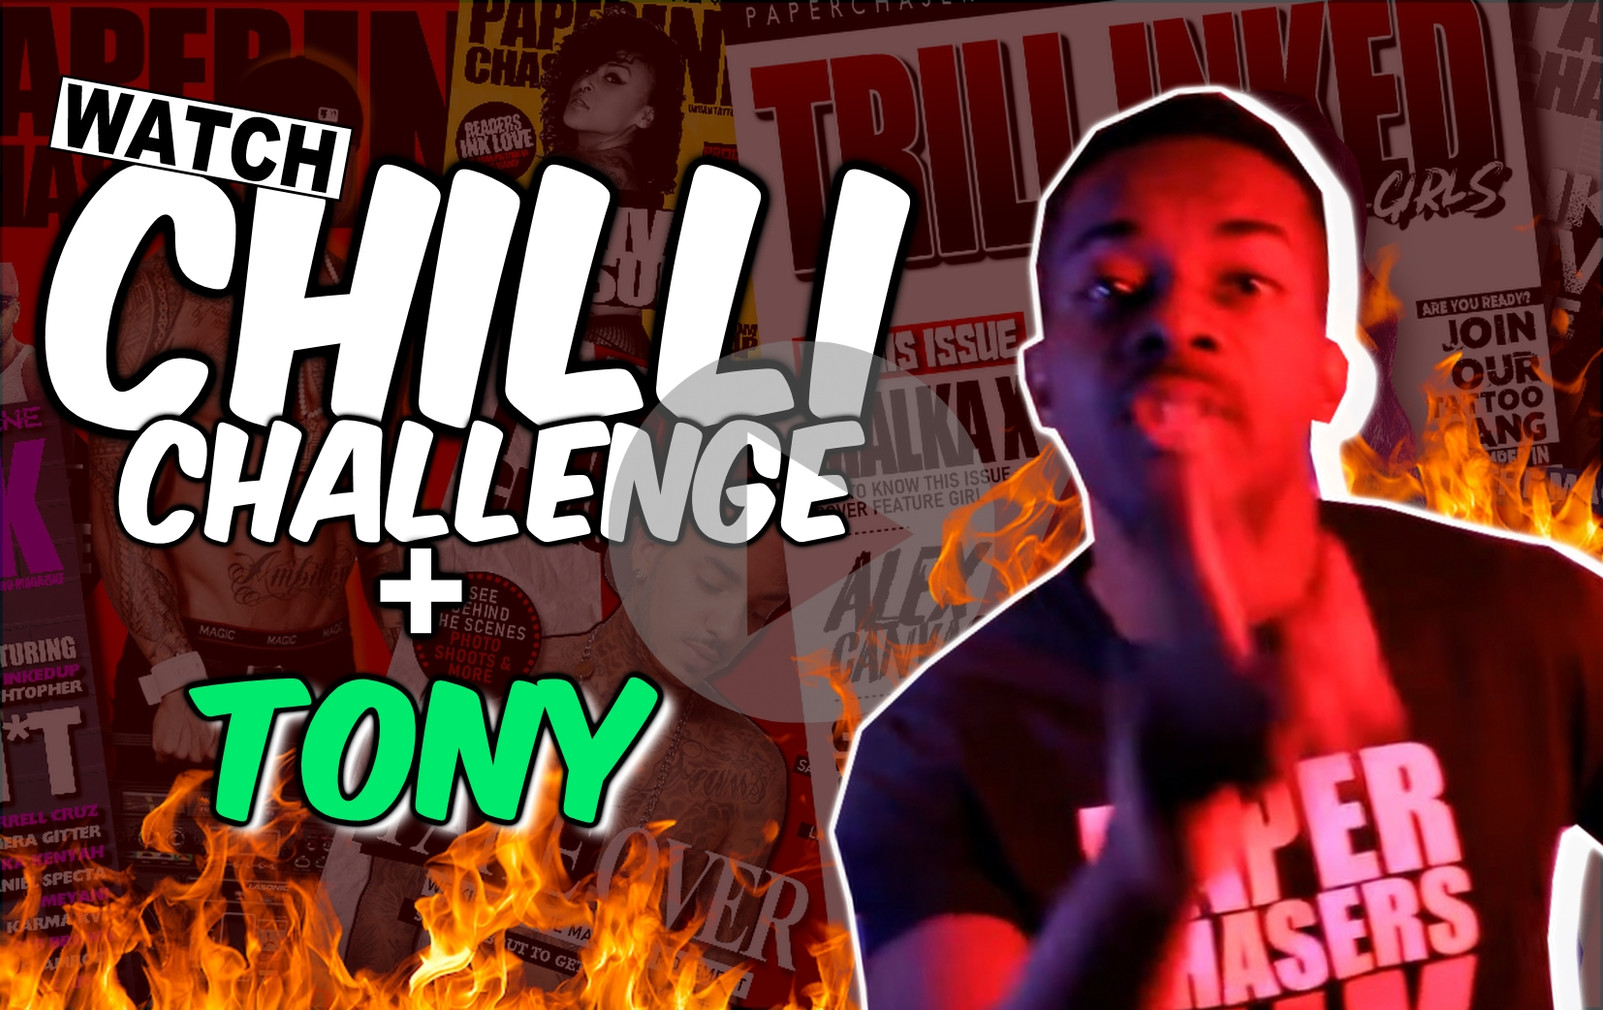 WATCH : GHOST CHILLI TATTOO CHALLENGE | TONY